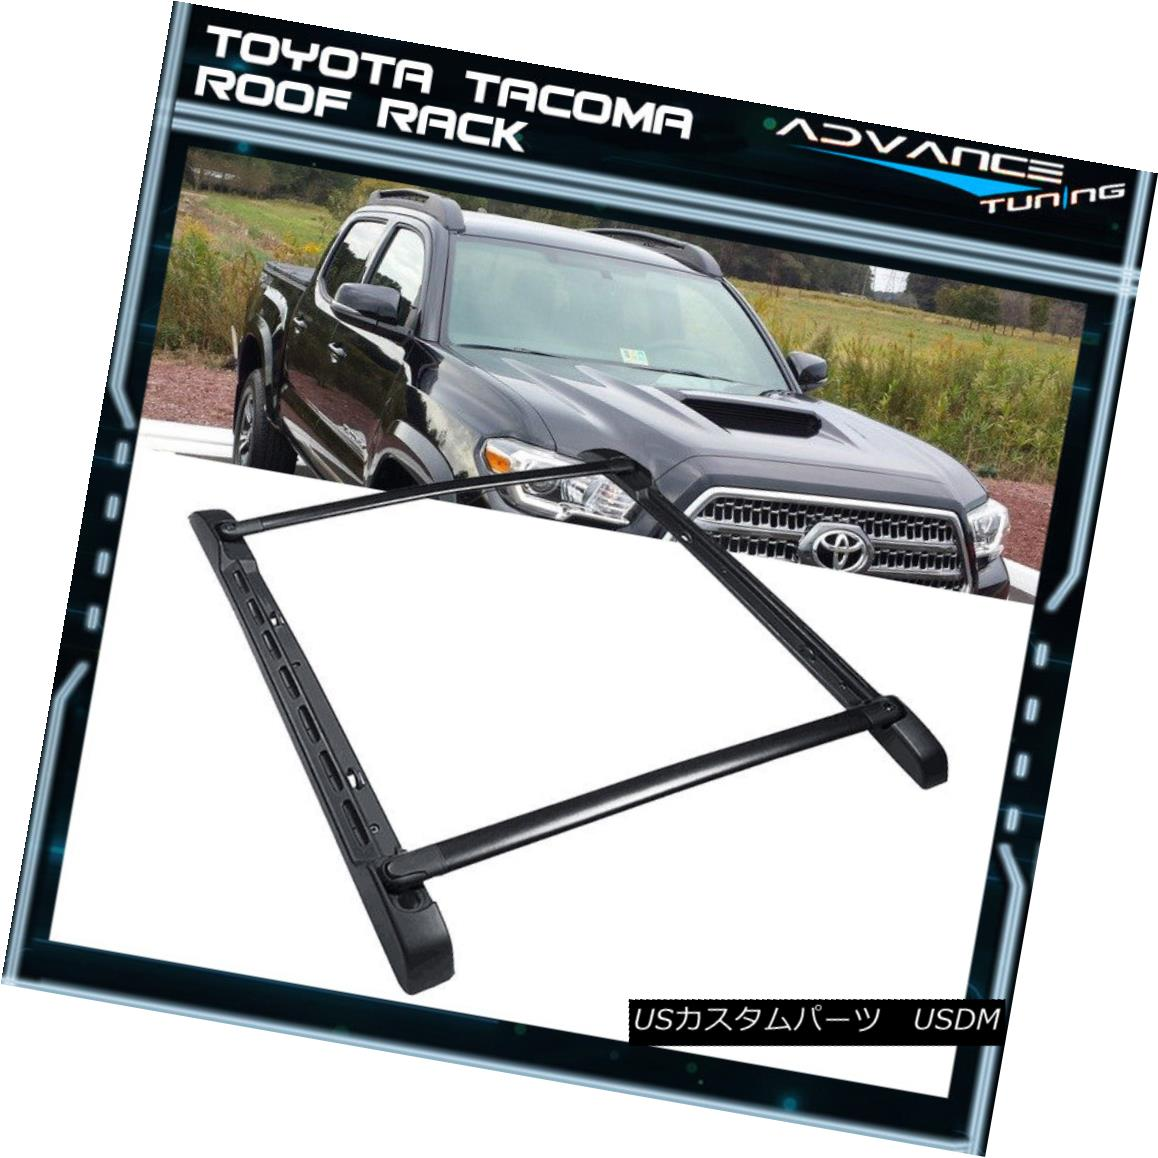 FIT 05-18 Toyota Tacoma Double Cab Roof Top Rack Aluminum Cross Bar Side Rails07